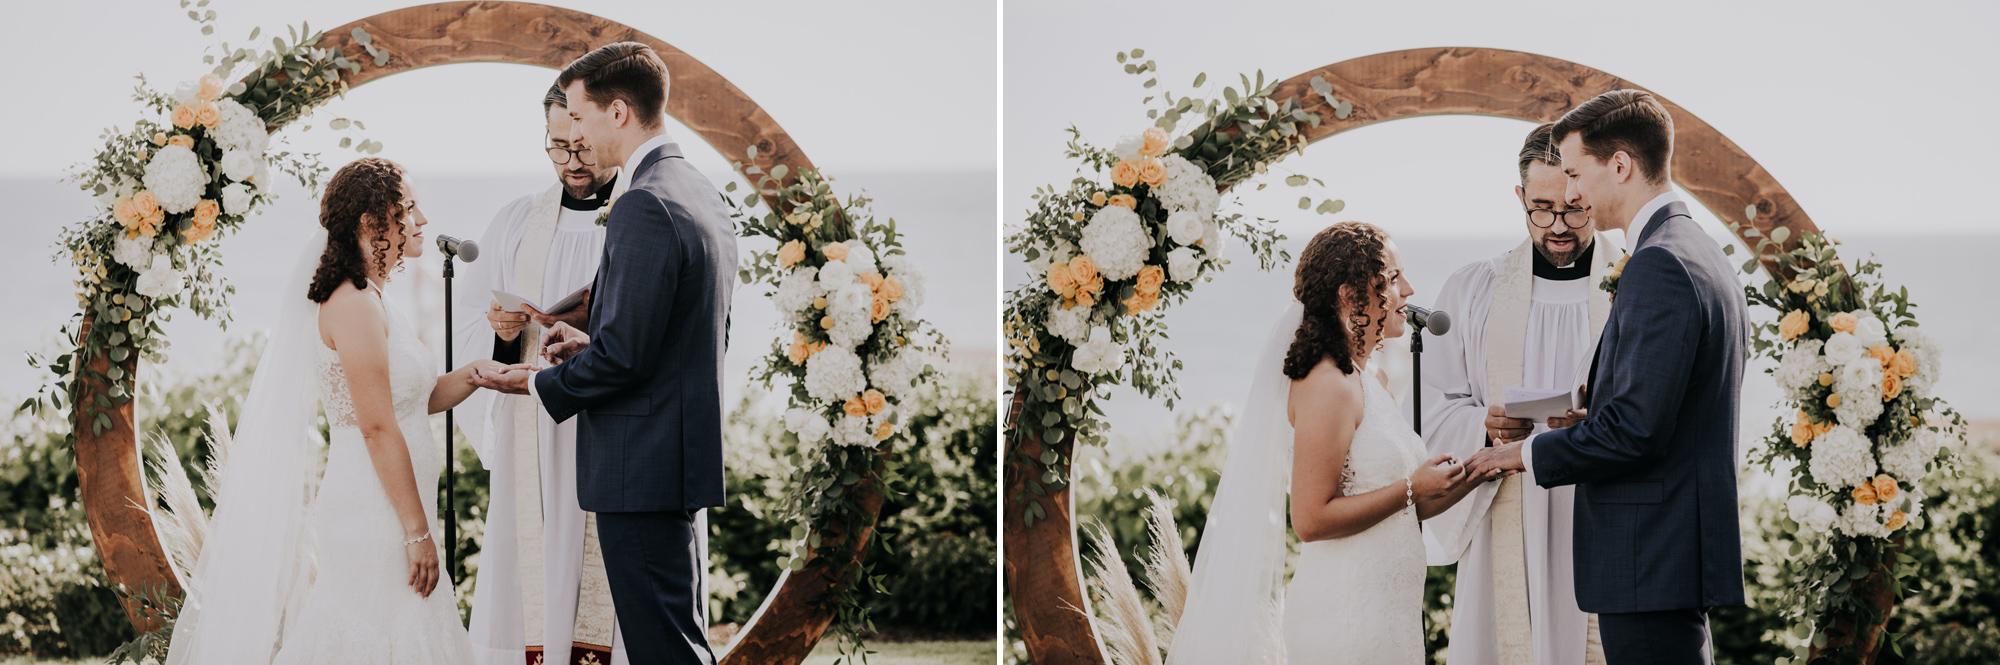 090-destination-wedding-san-clemente-california.jpg